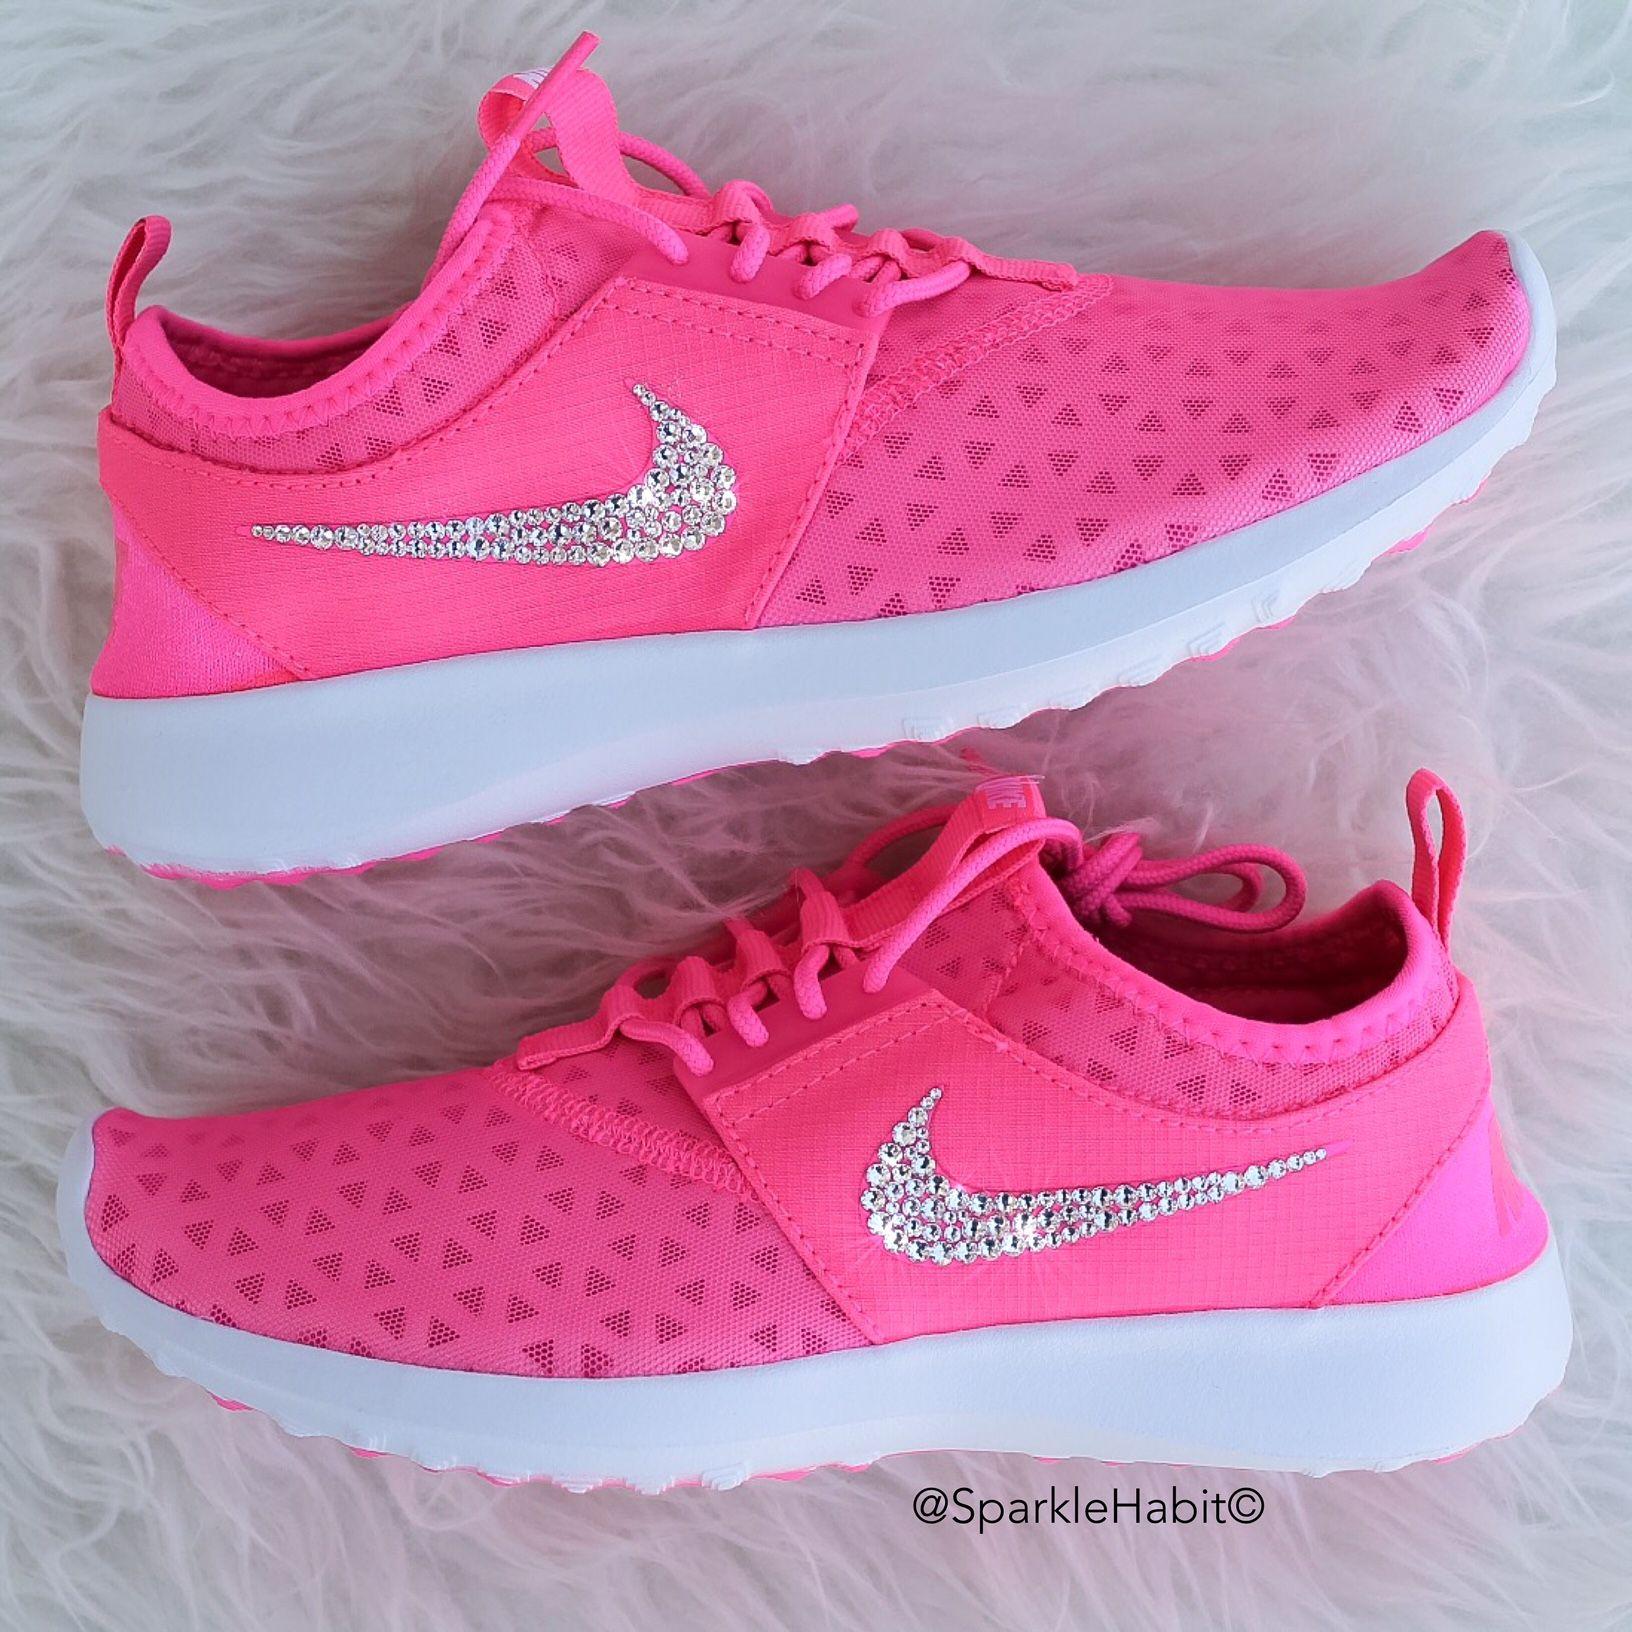 9d8923672ccdd Women s Nike Juvenate w  Swarovski Rhinestones - Hot Pink   Glitterfix